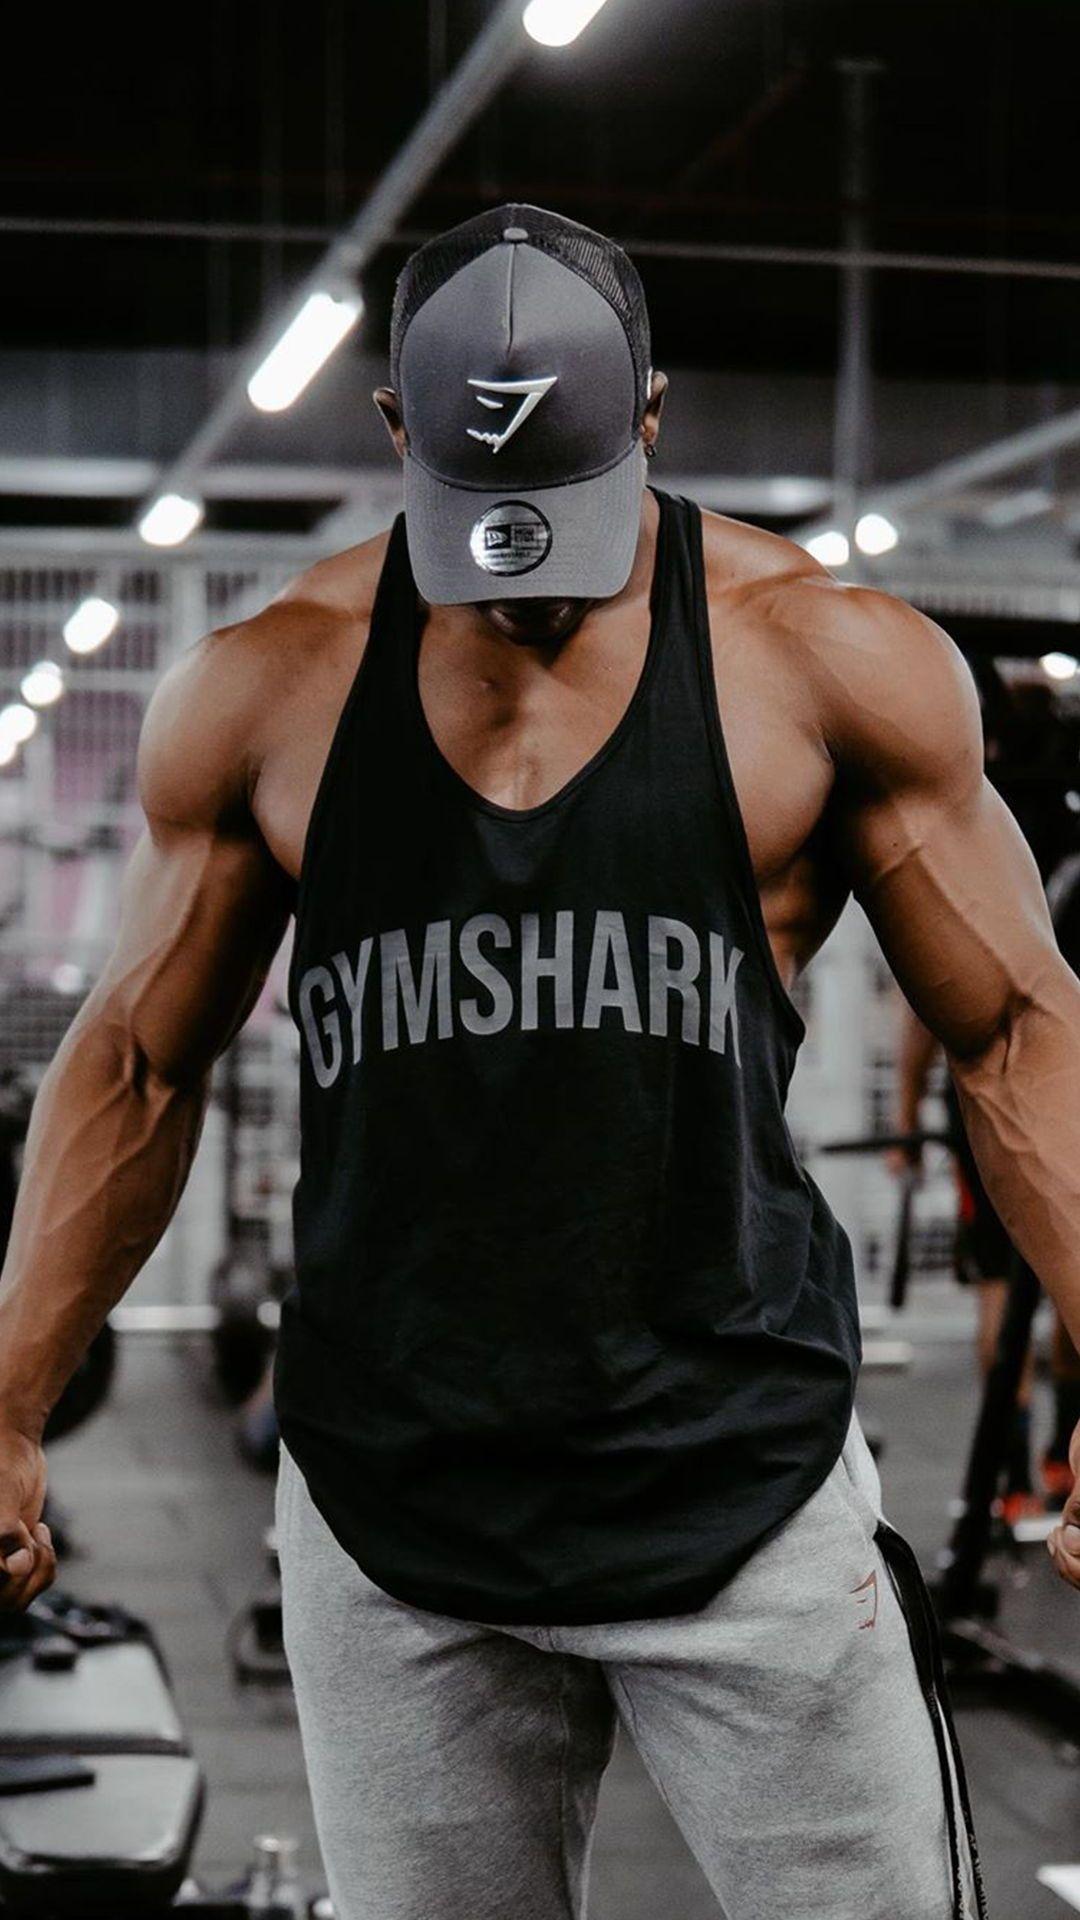 Gymshark Power Stringer Gym Photography Body Builders Men Fitness Photos